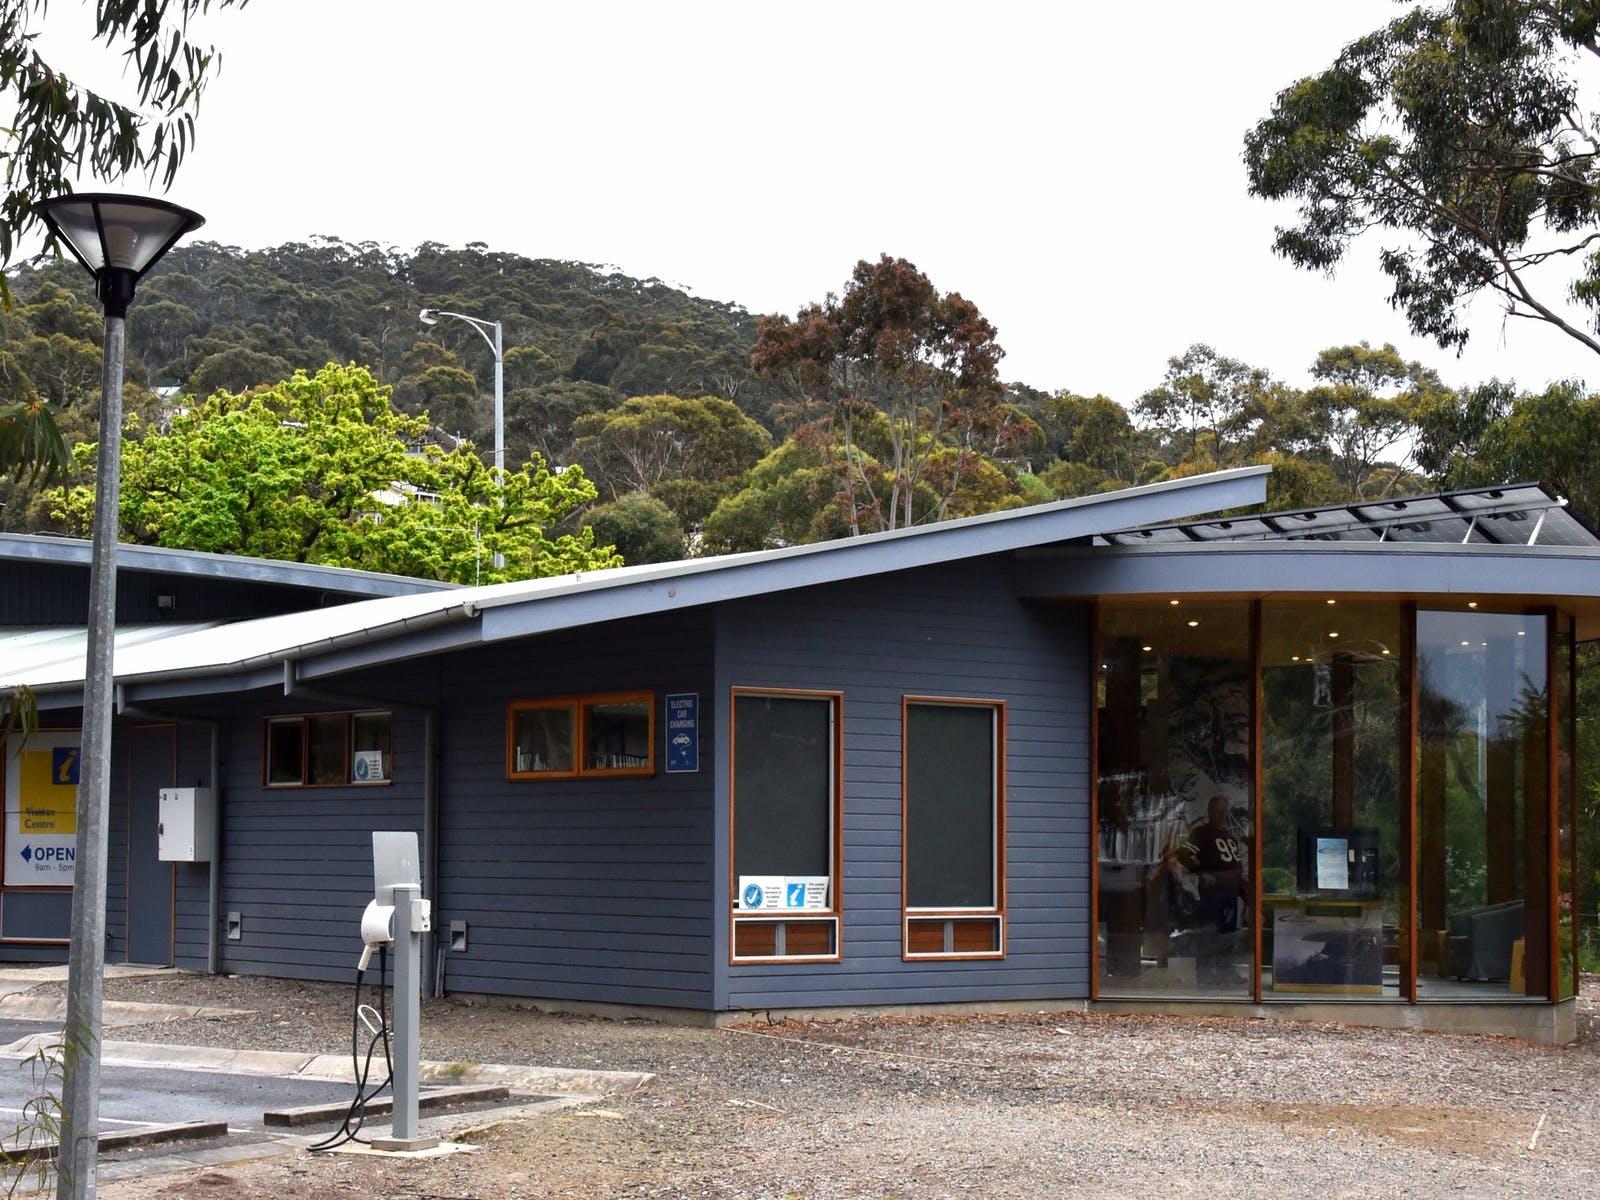 Lorne Visitor Centre